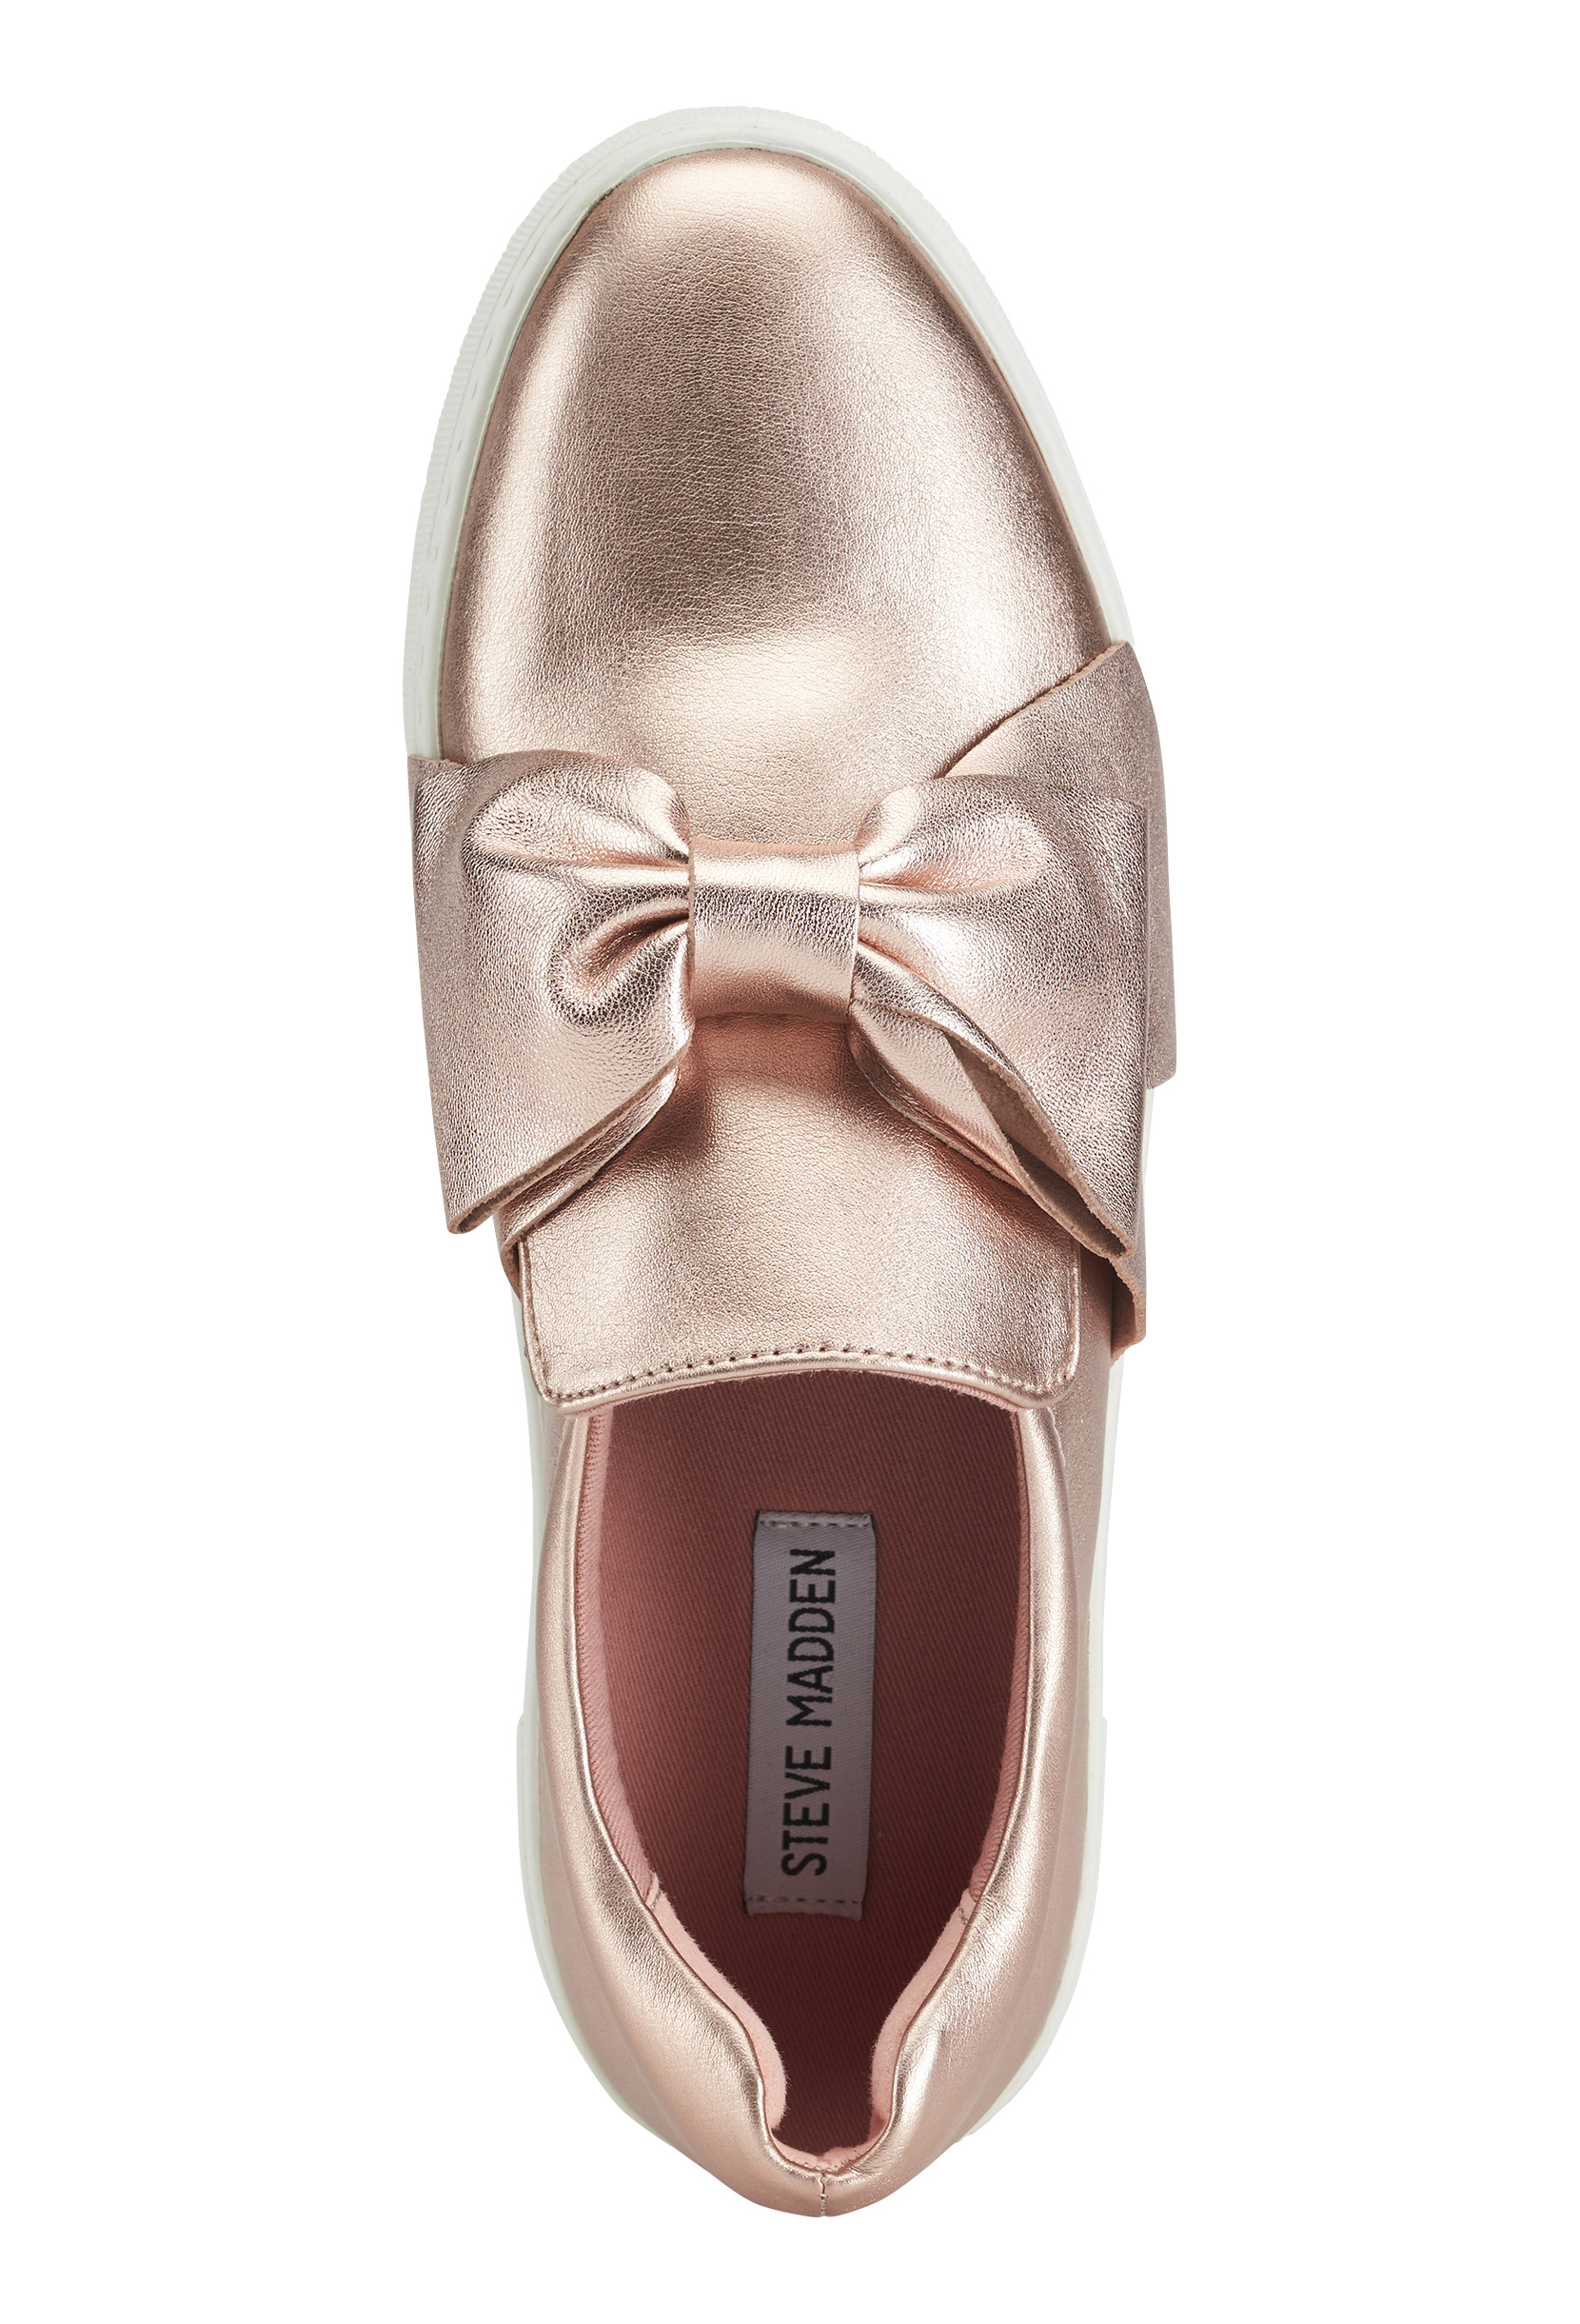 Hornear Misión todos los días  Steve Madden Empire Slip-on Shoes Rose Gold - Bubbleroom